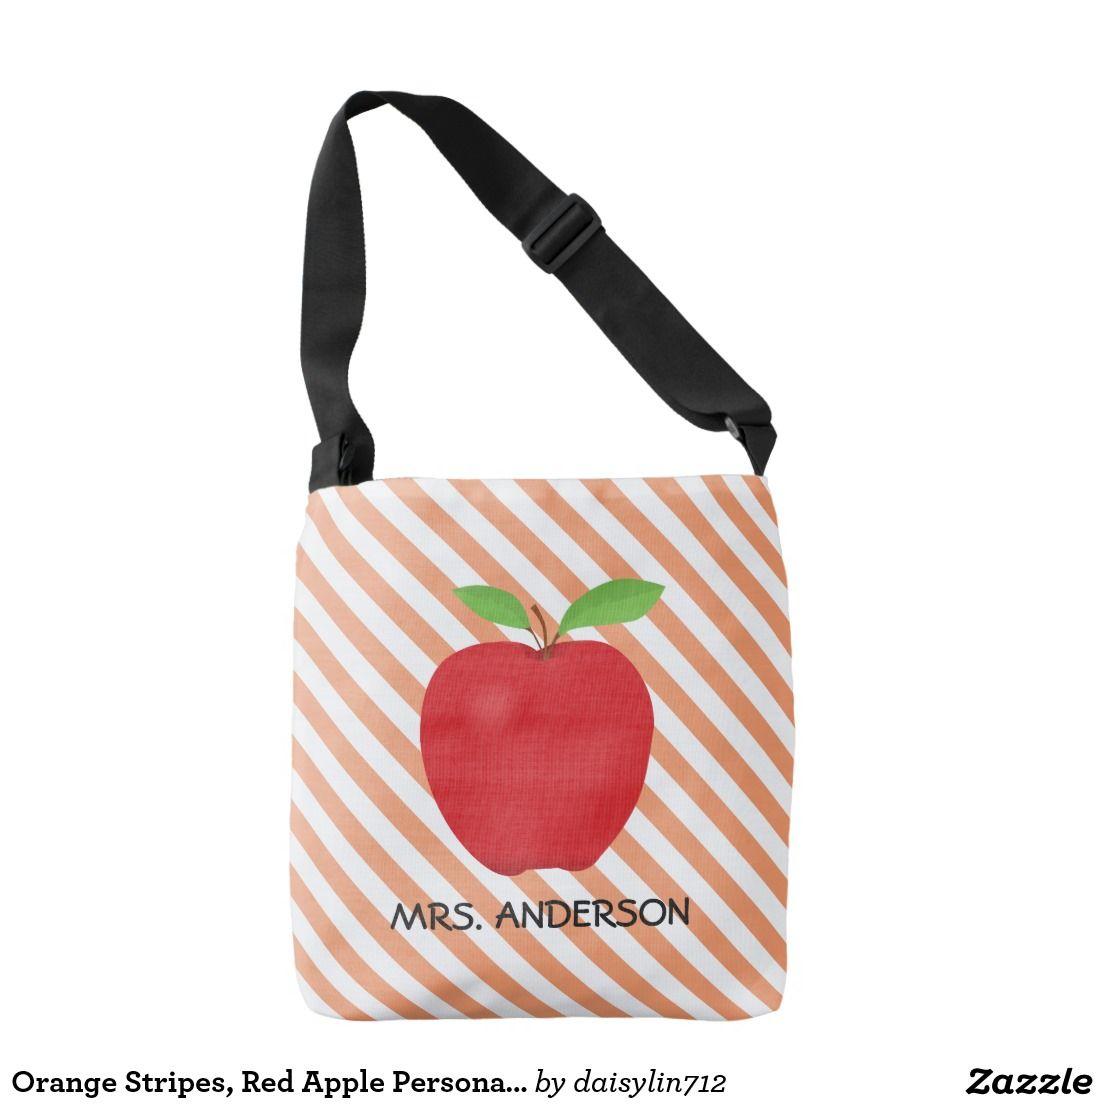 Orange Stripes, Red Apple Personalized Teacher totebag